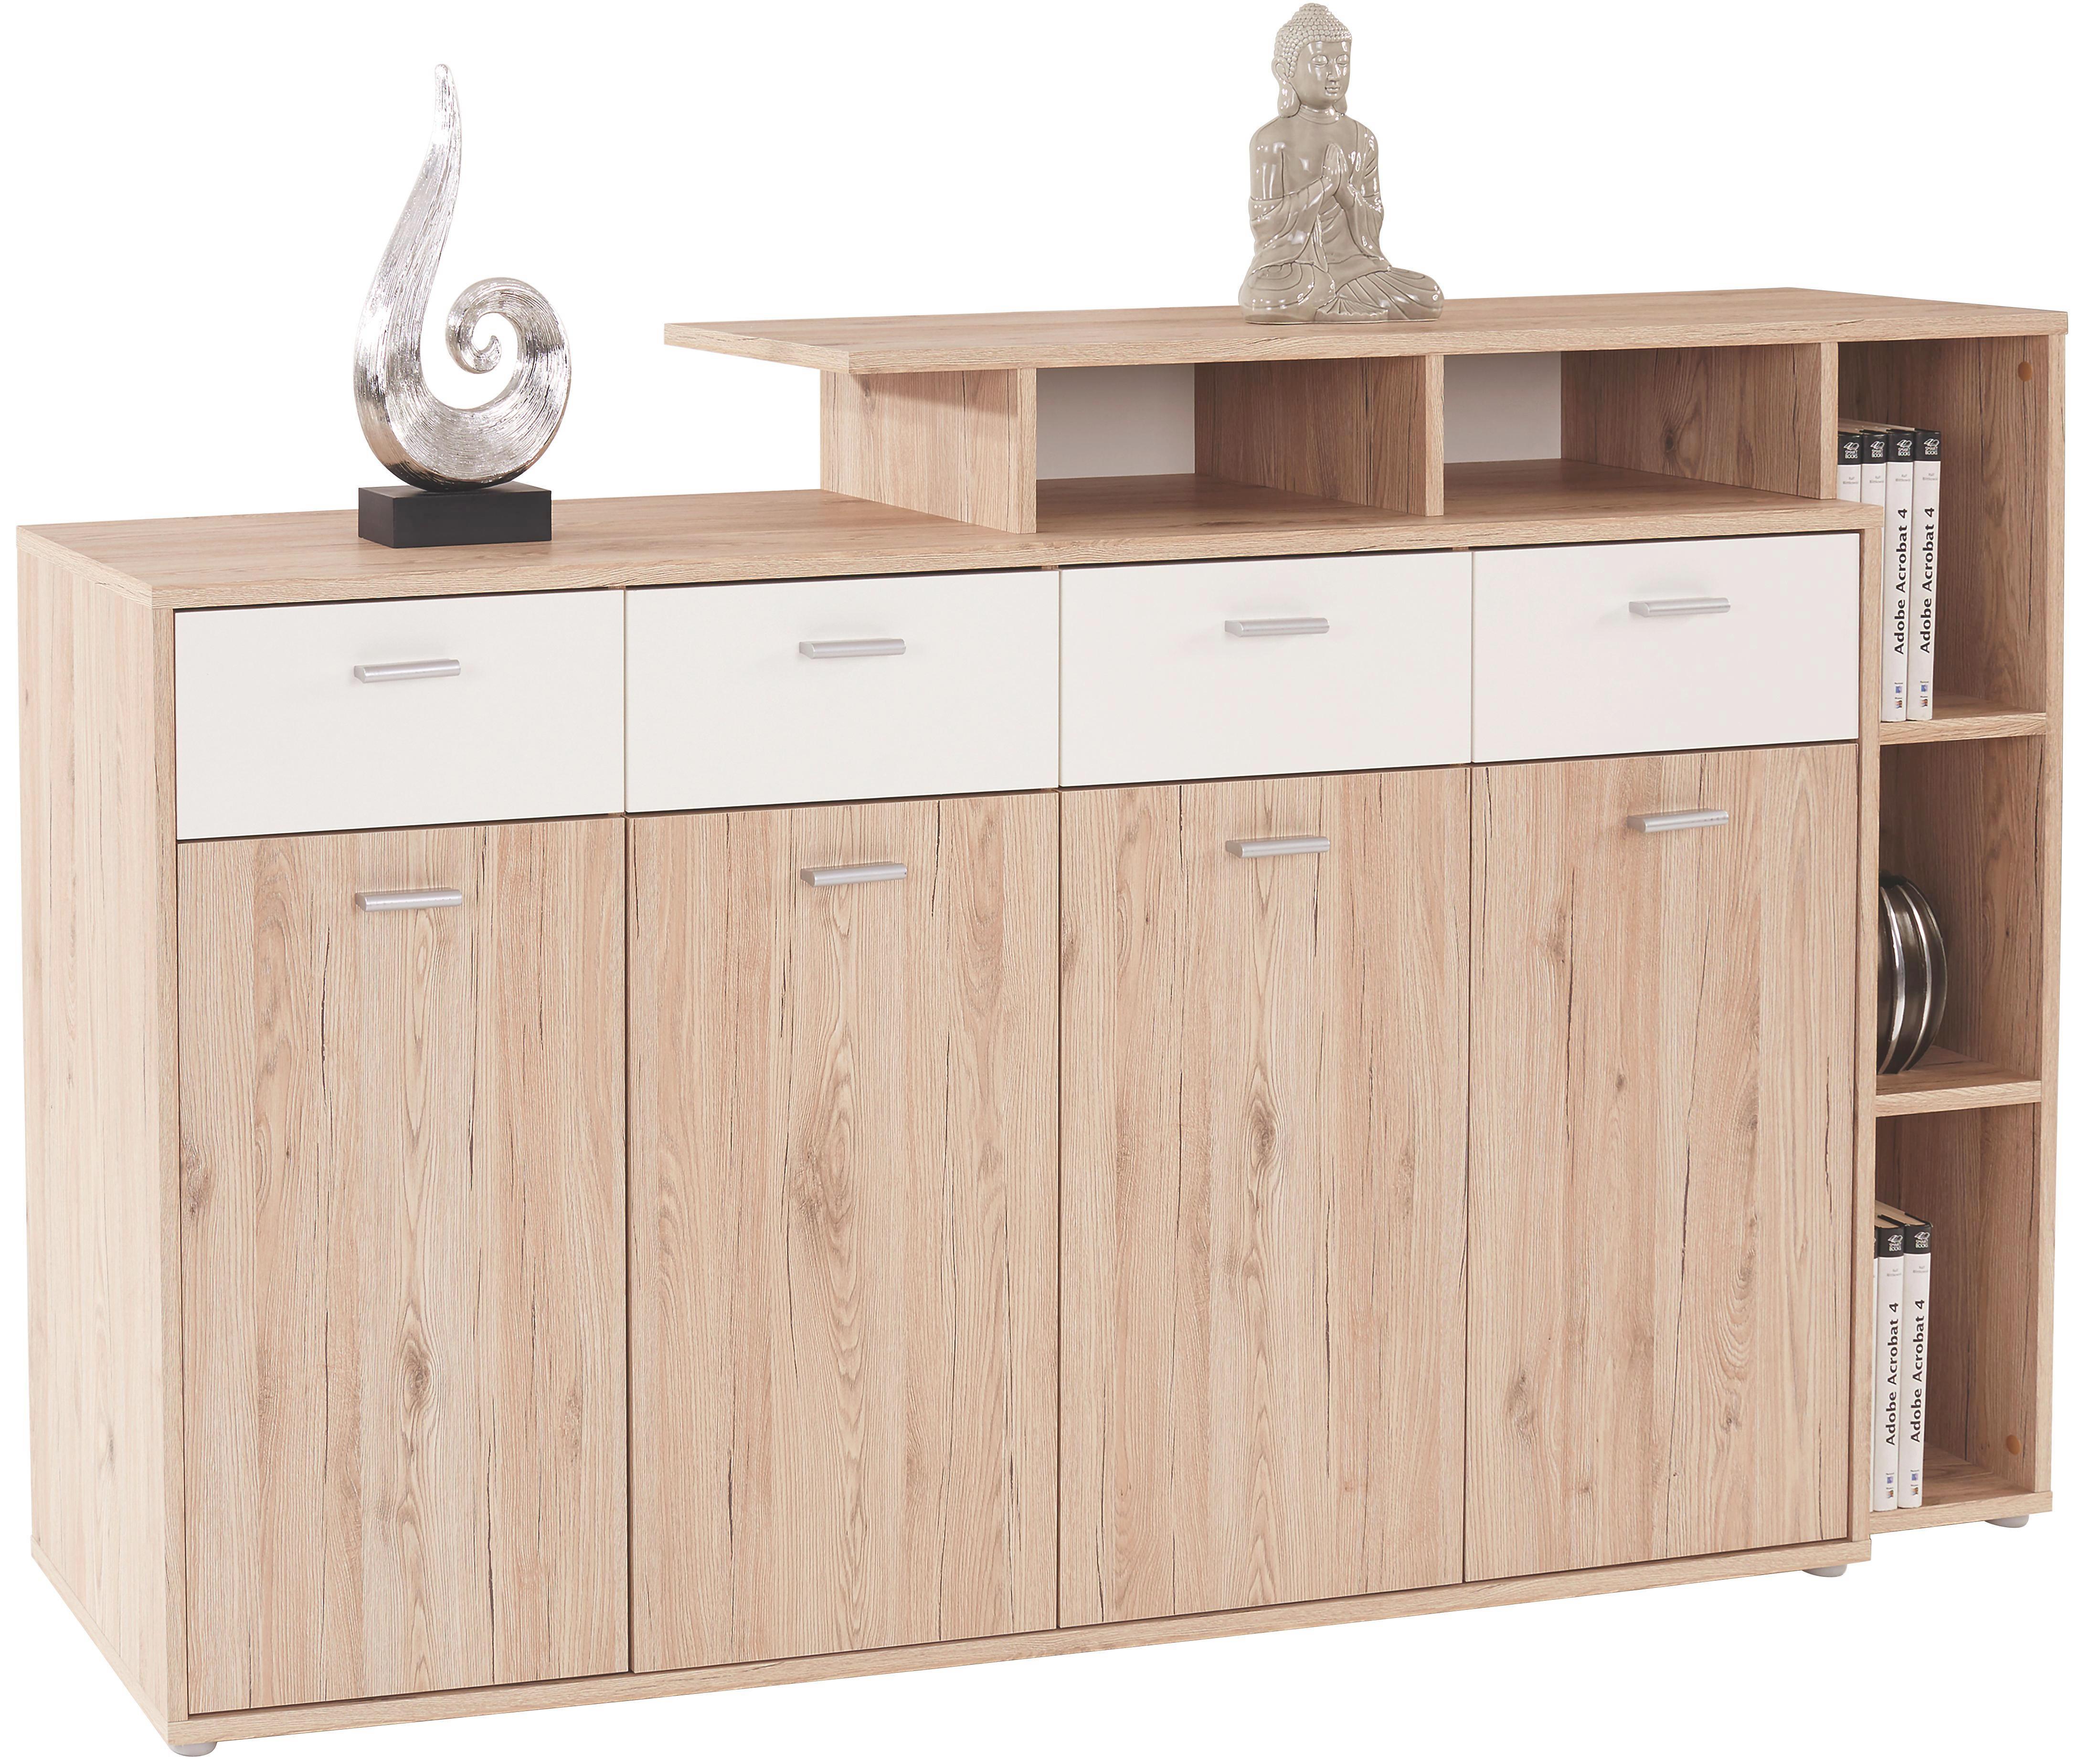 hellweg kuche. Black Bedroom Furniture Sets. Home Design Ideas